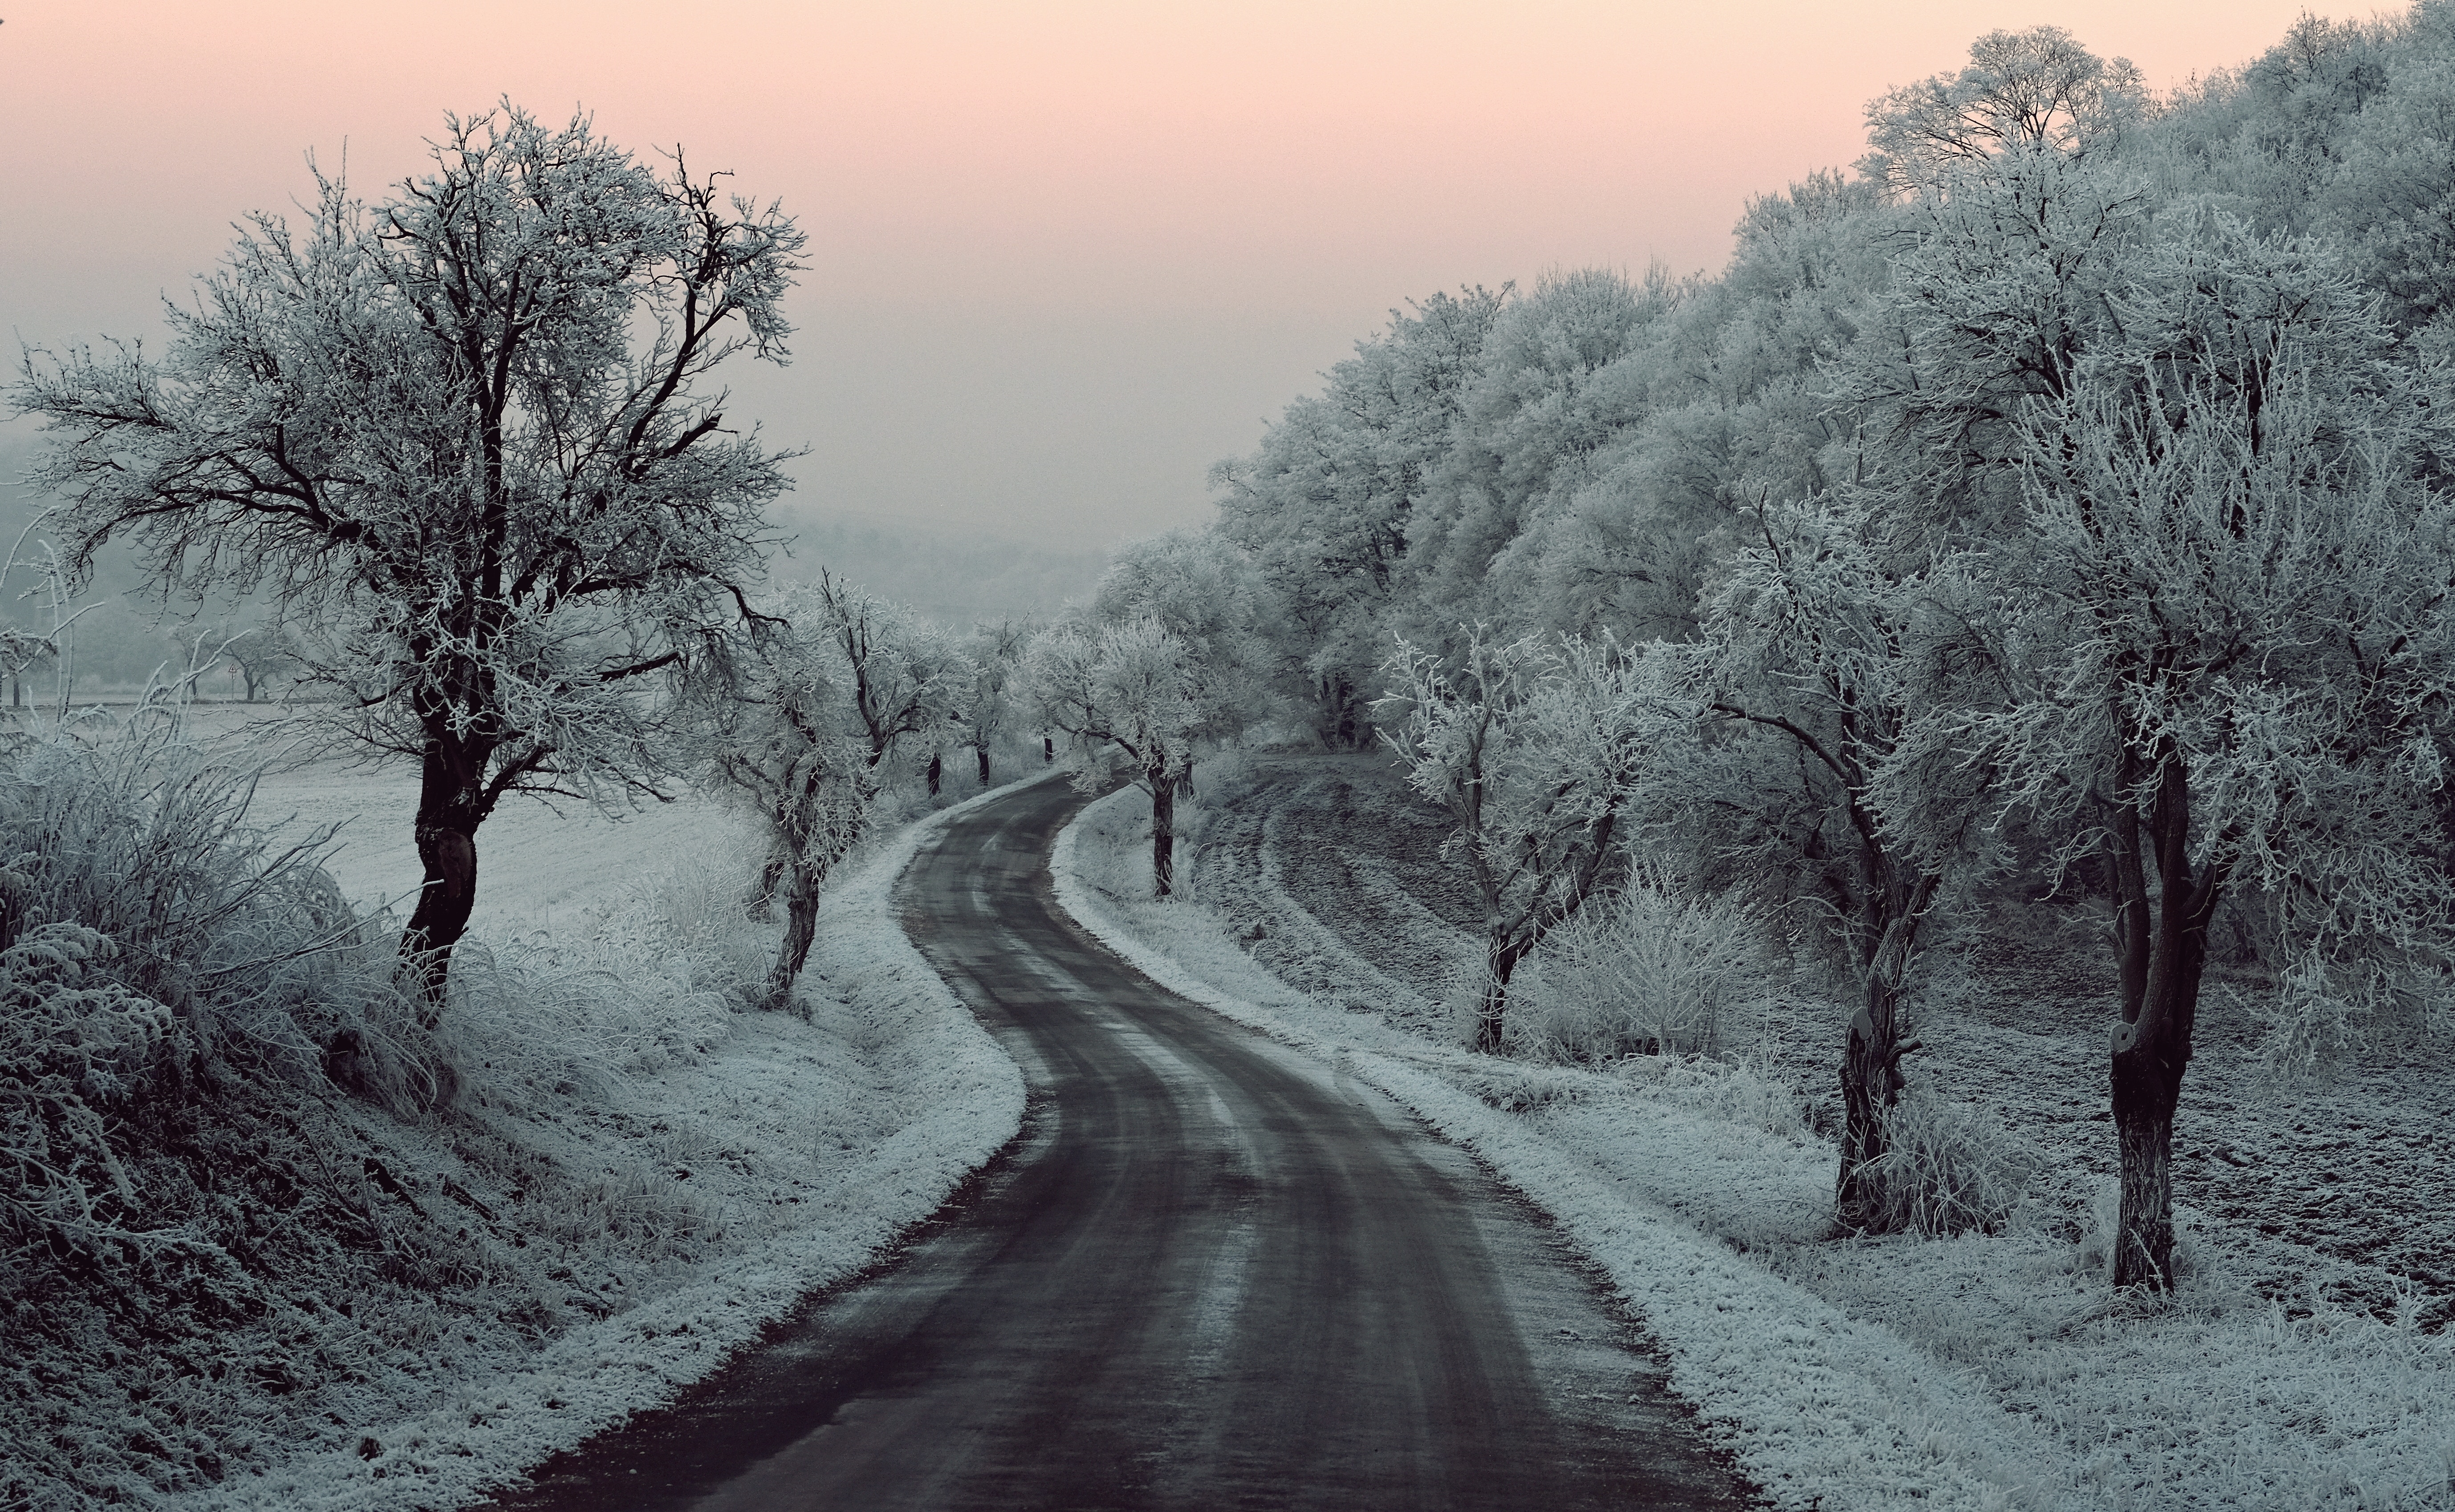 Winter Road Snow Frozen Trees On Sides 5k